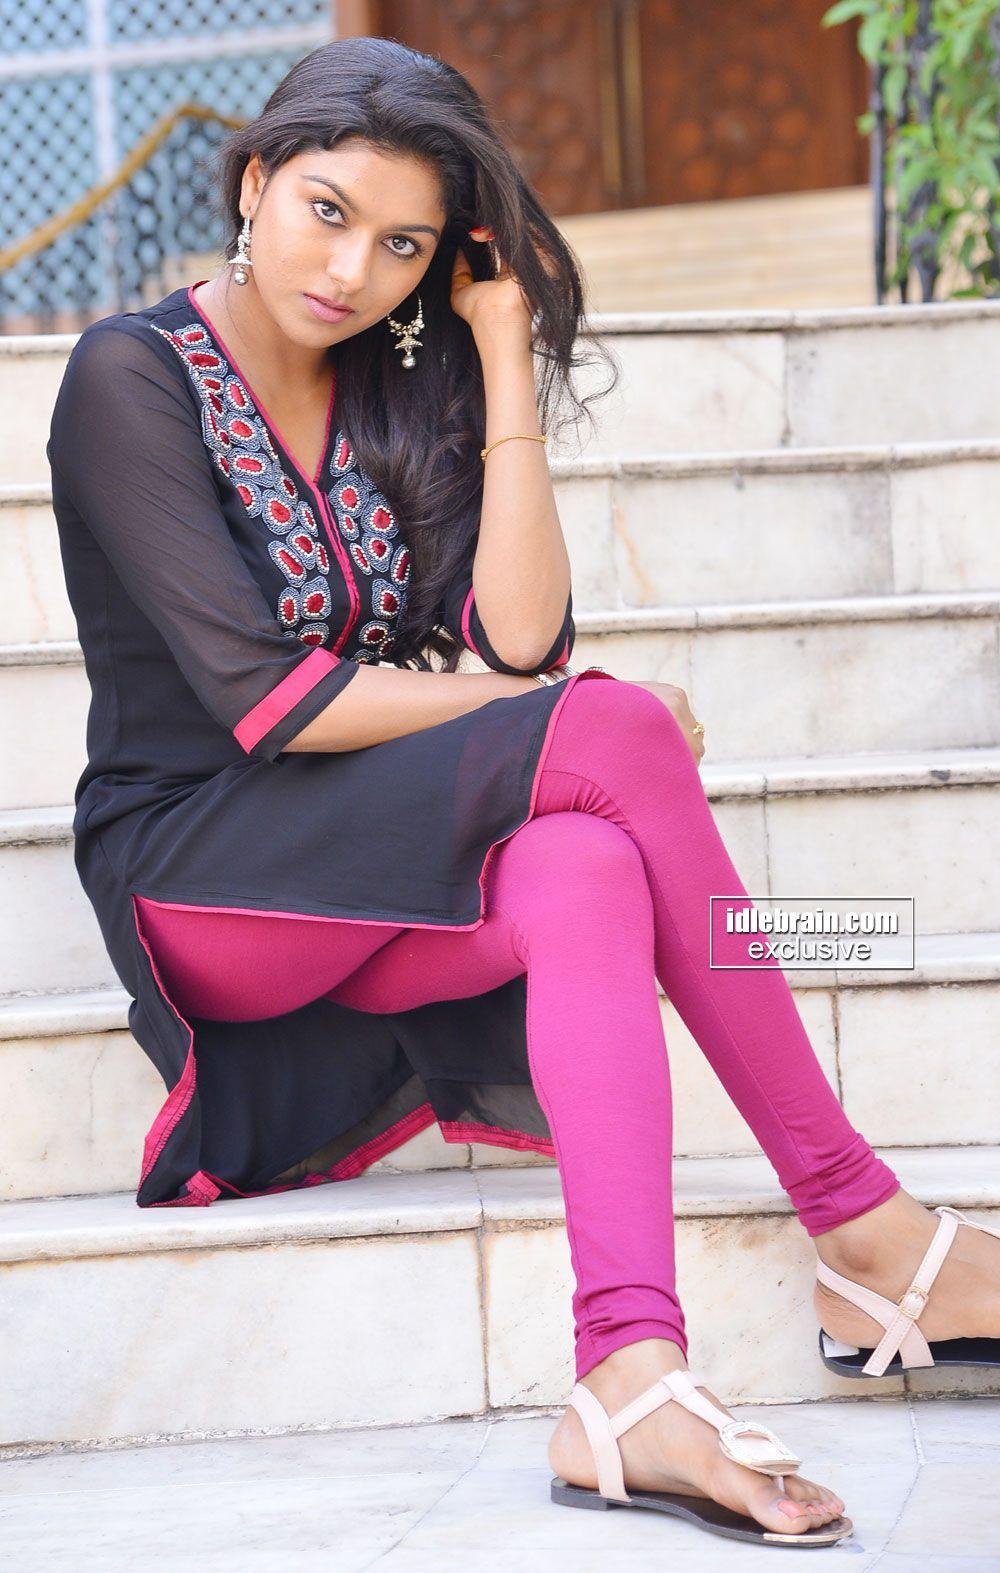 kerala-girls-hot-legs-image-india-sex-moive